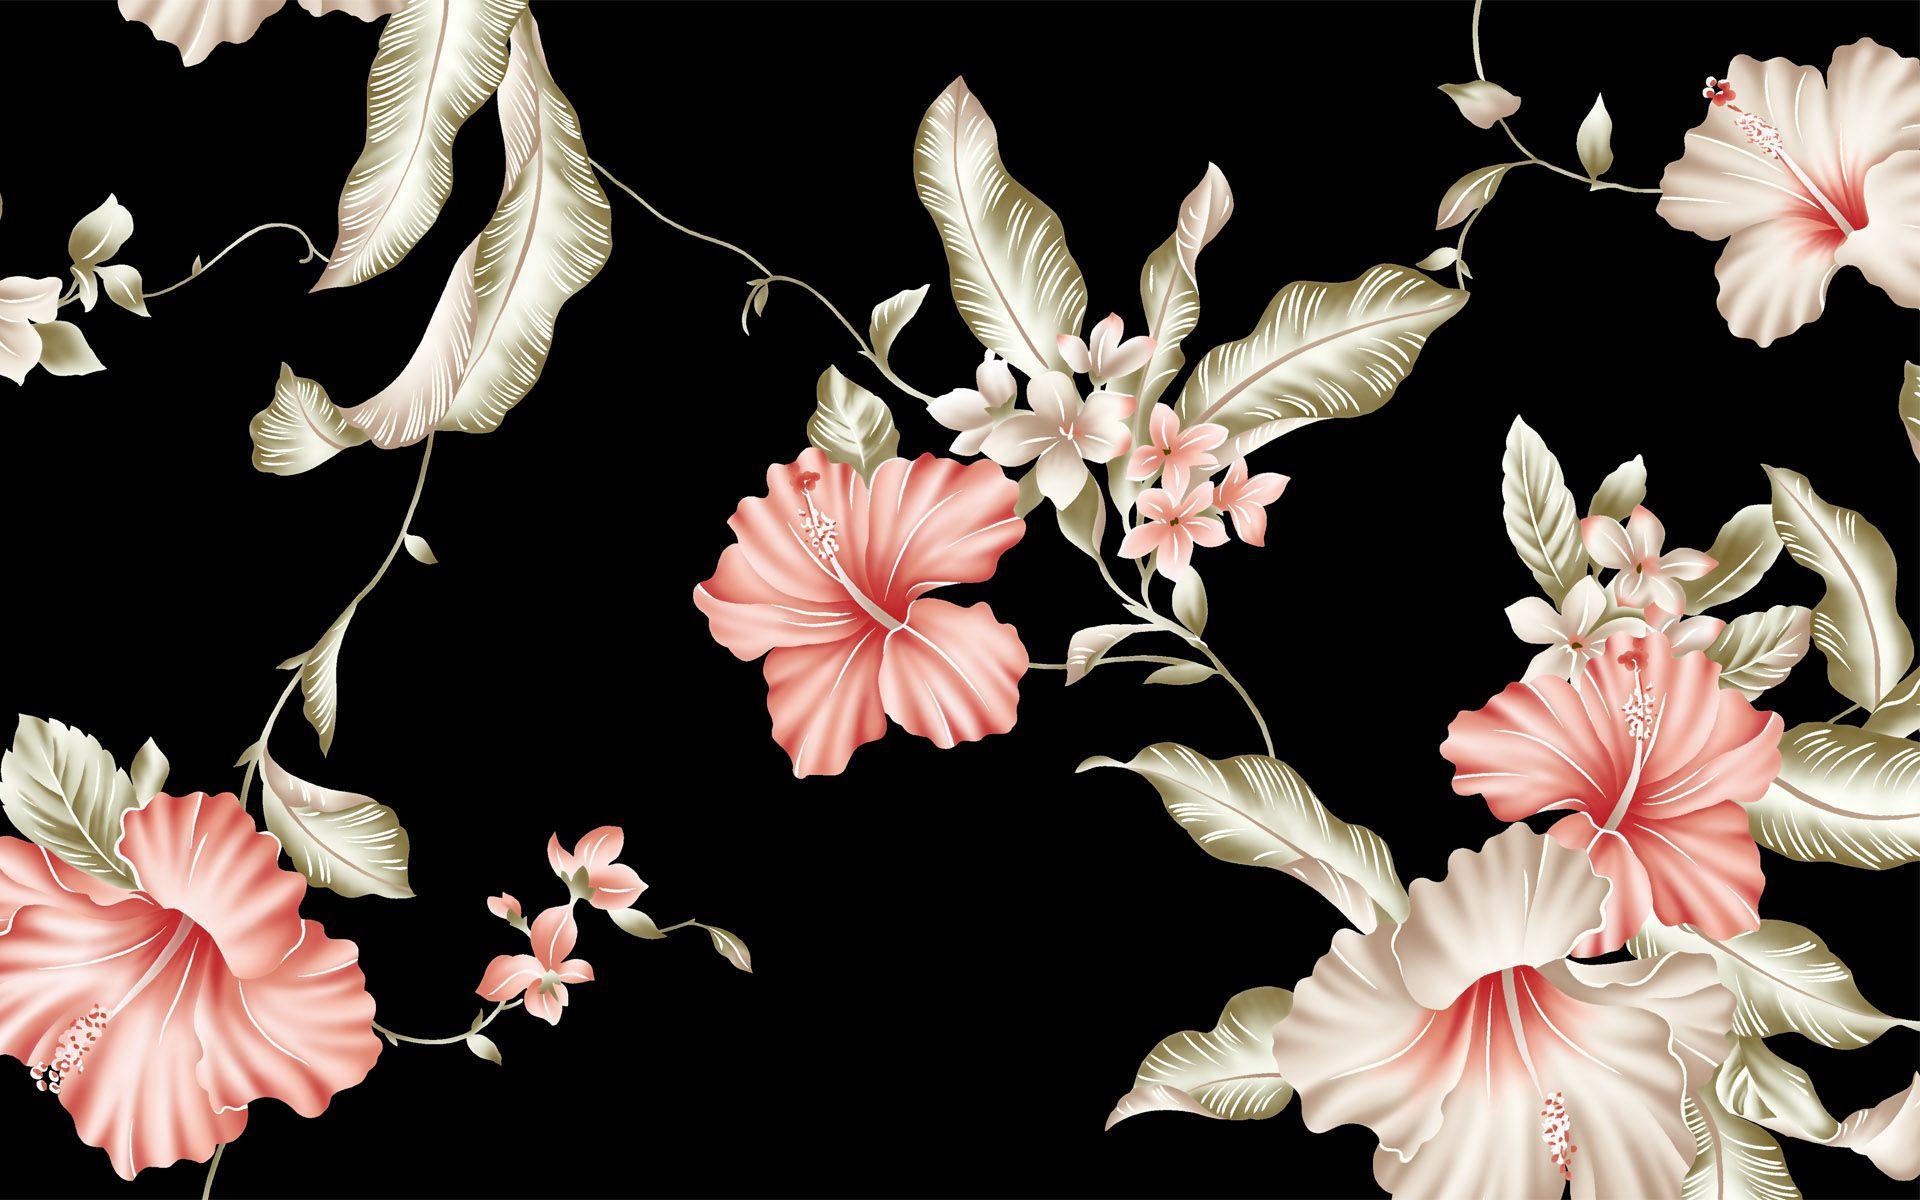 hibiscus flower wallpapers - wallpaper cave